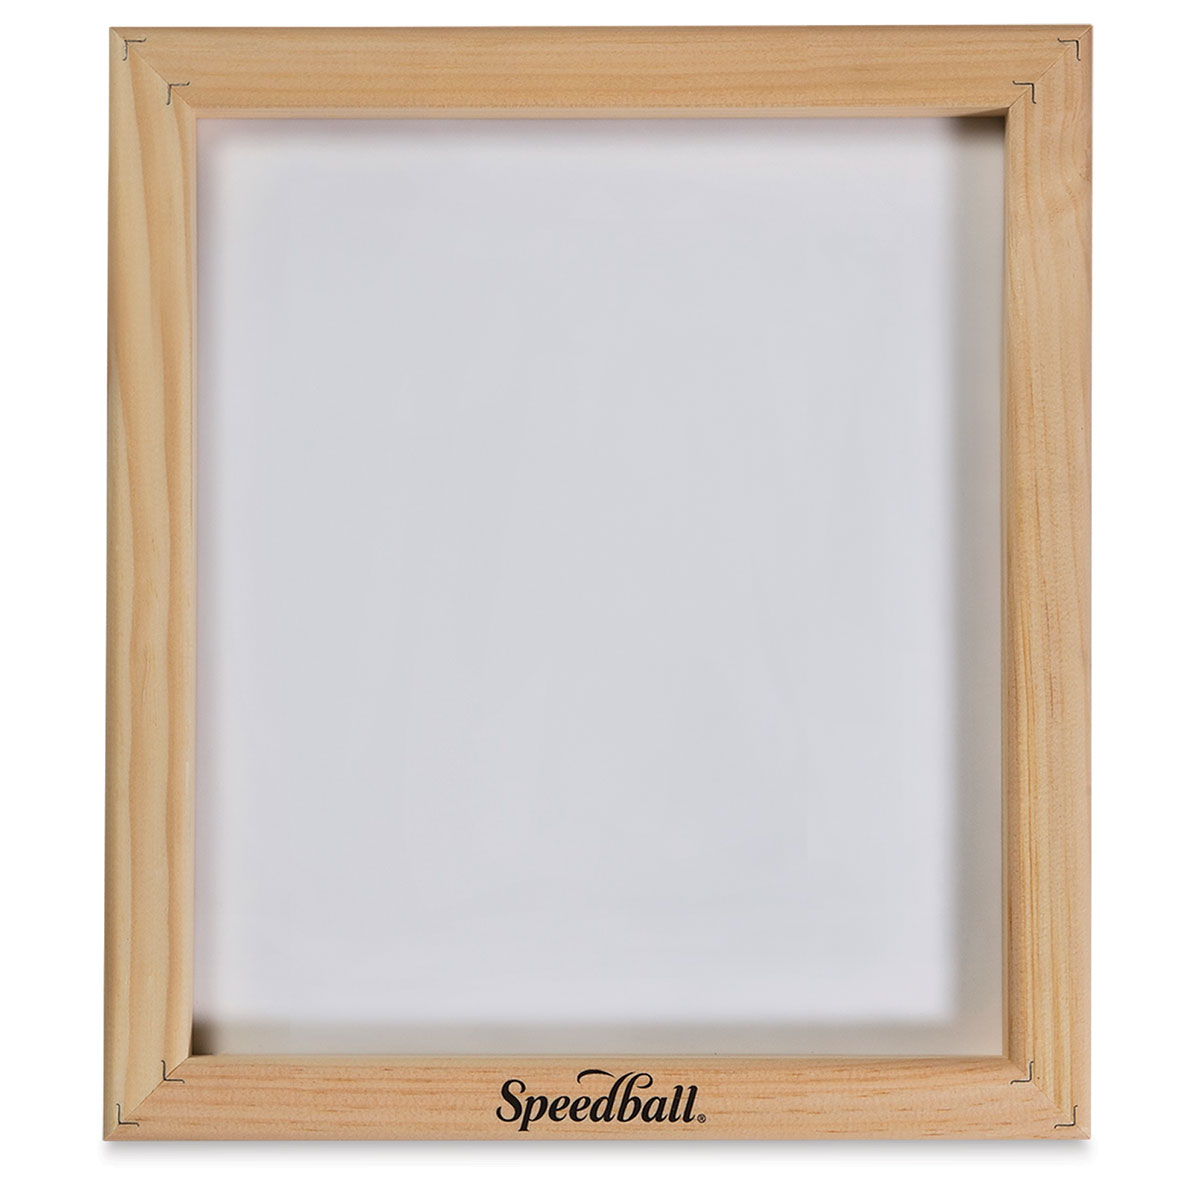 Speedball Screenprinting Frame - 110 Monofilament - 8 x 10